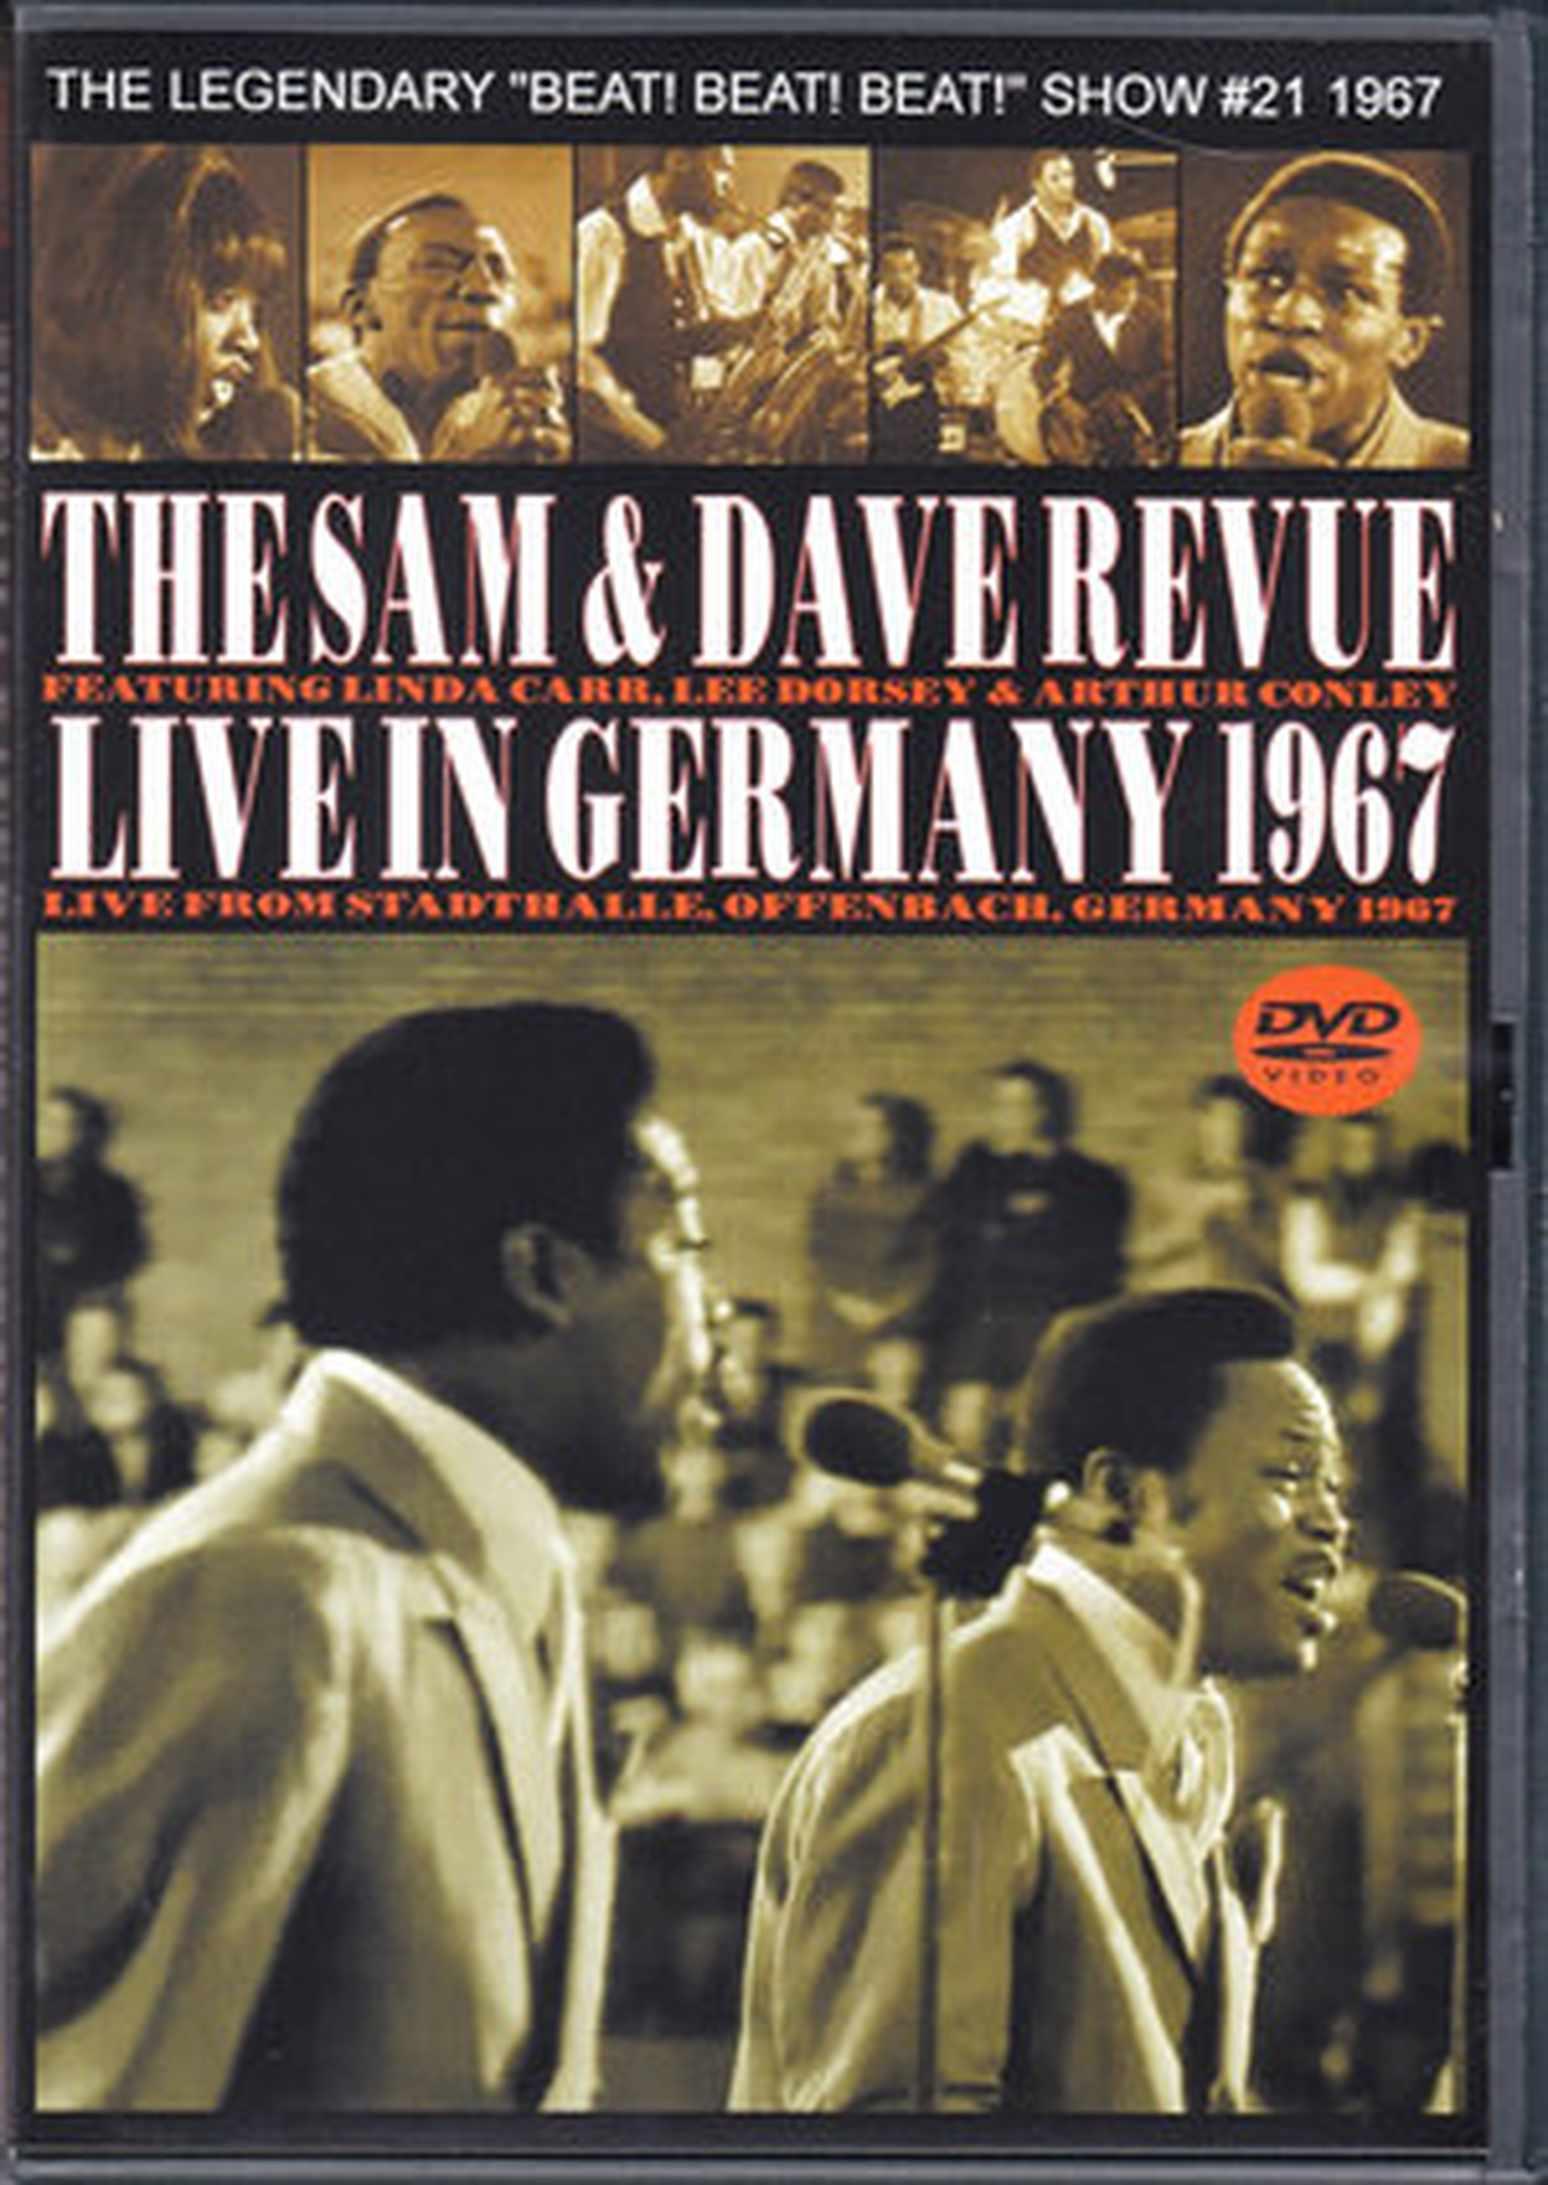 Sam & Dave サム・アンド・デイヴ/Germany 1967 & More